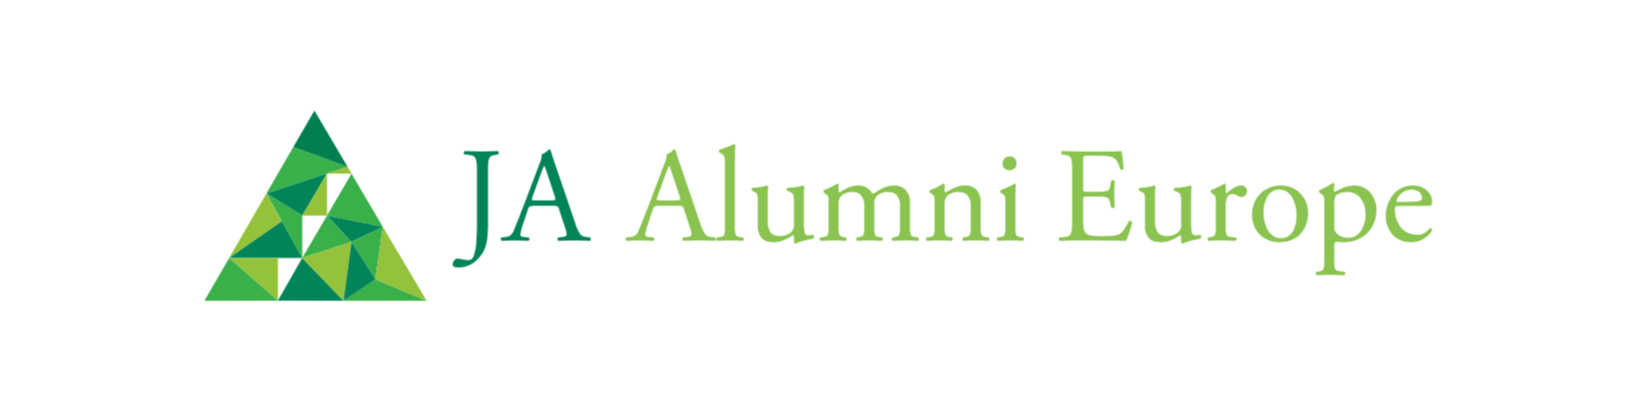 Alternative, no-tagline logotype